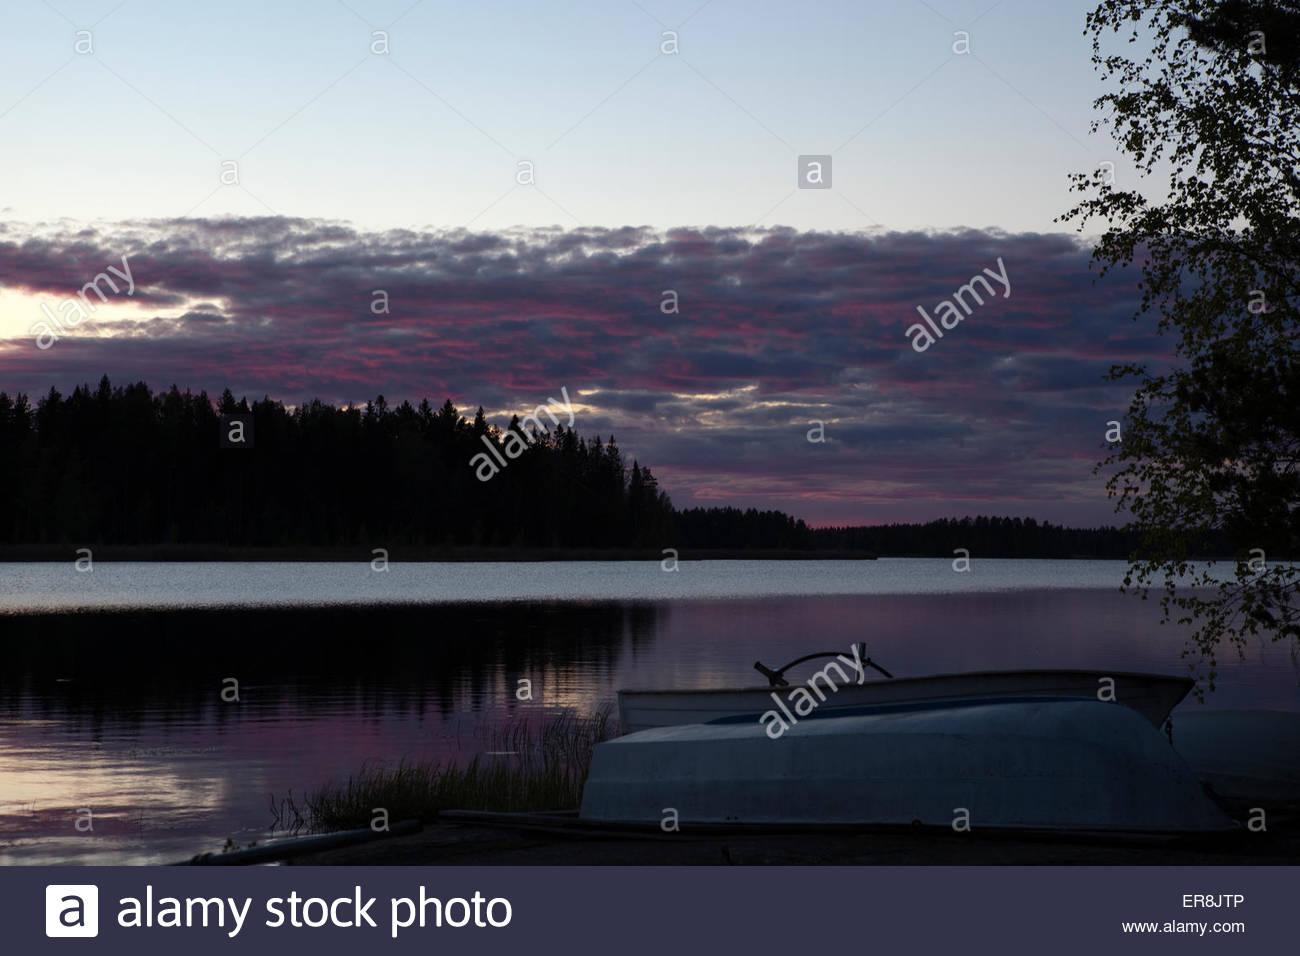 A peaceful spring night at the lake Koskeljärvi - Stock Image